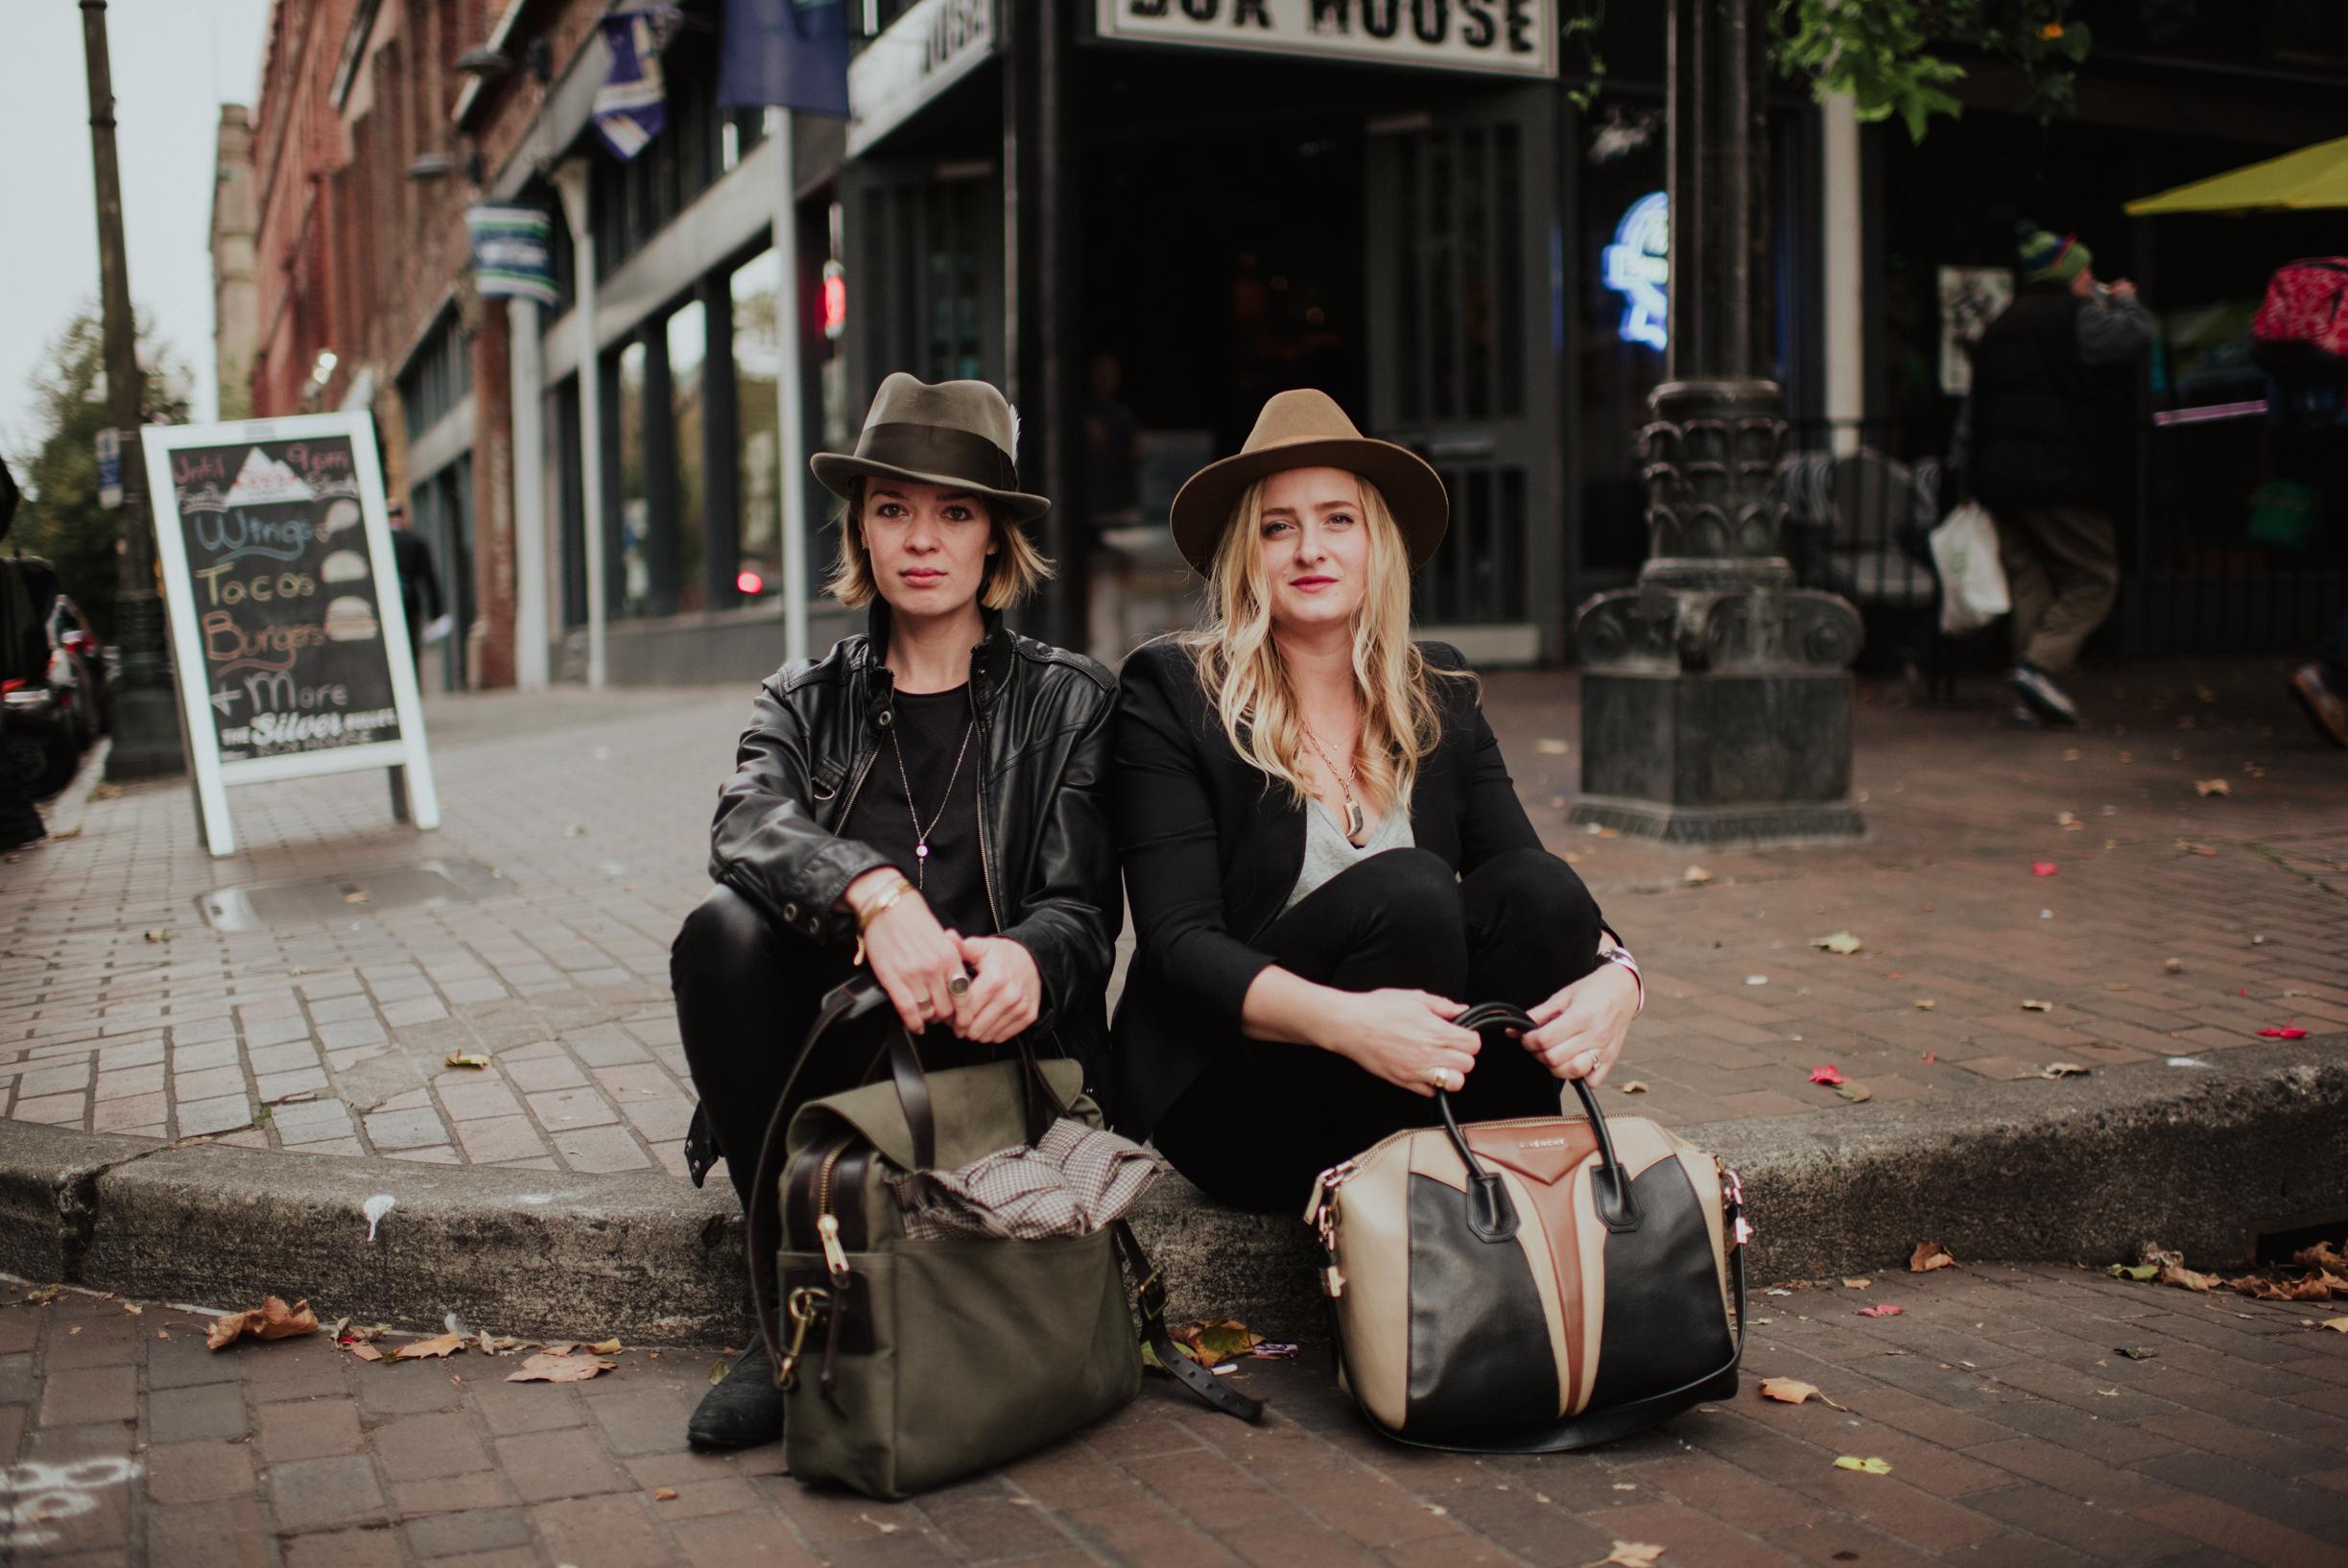 Seatle-Lifestyle-Photographer-Lindsey-Bolling-1327-4.jpg